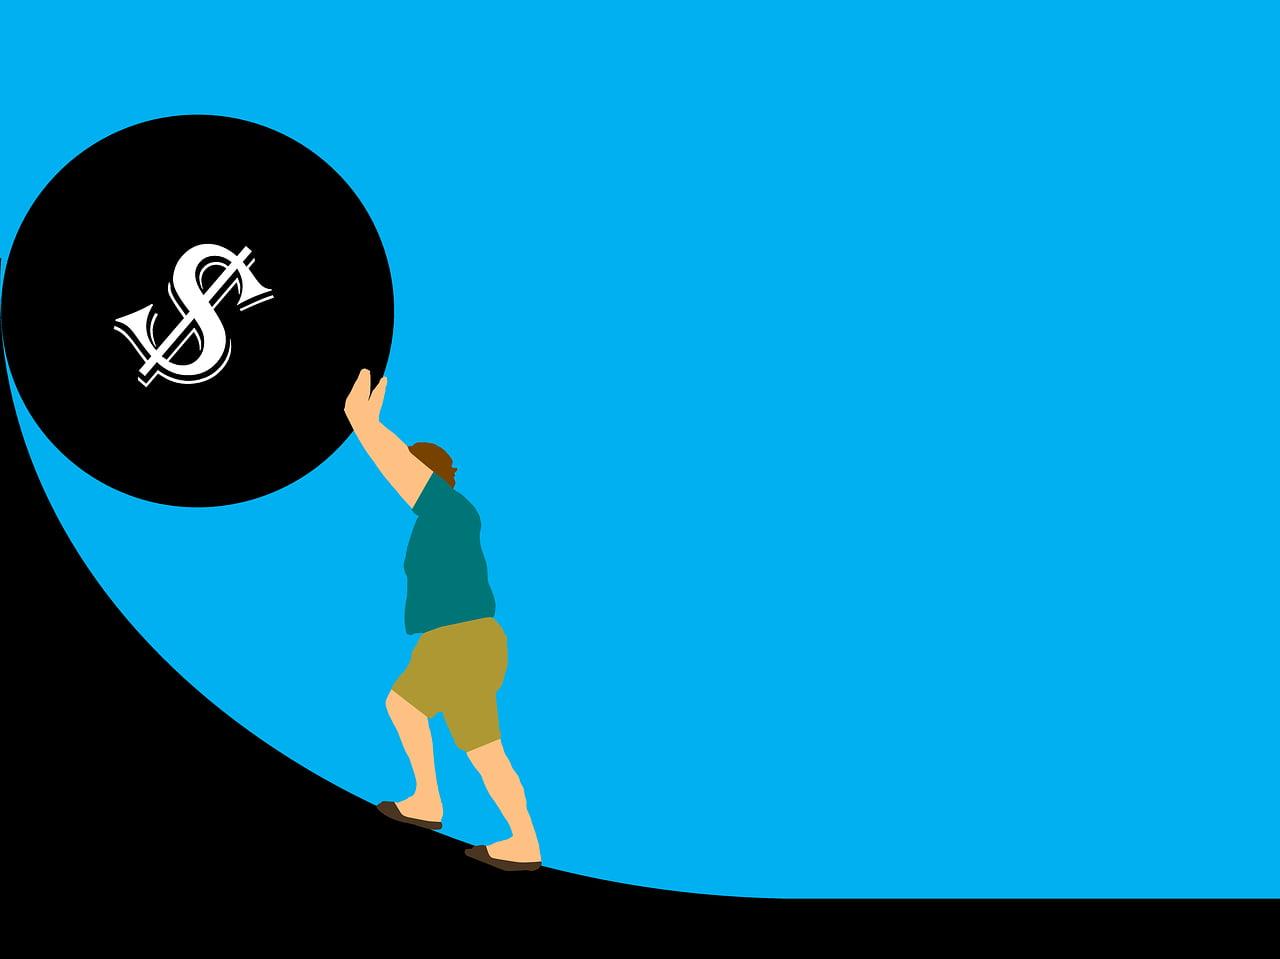 debt, money, credit